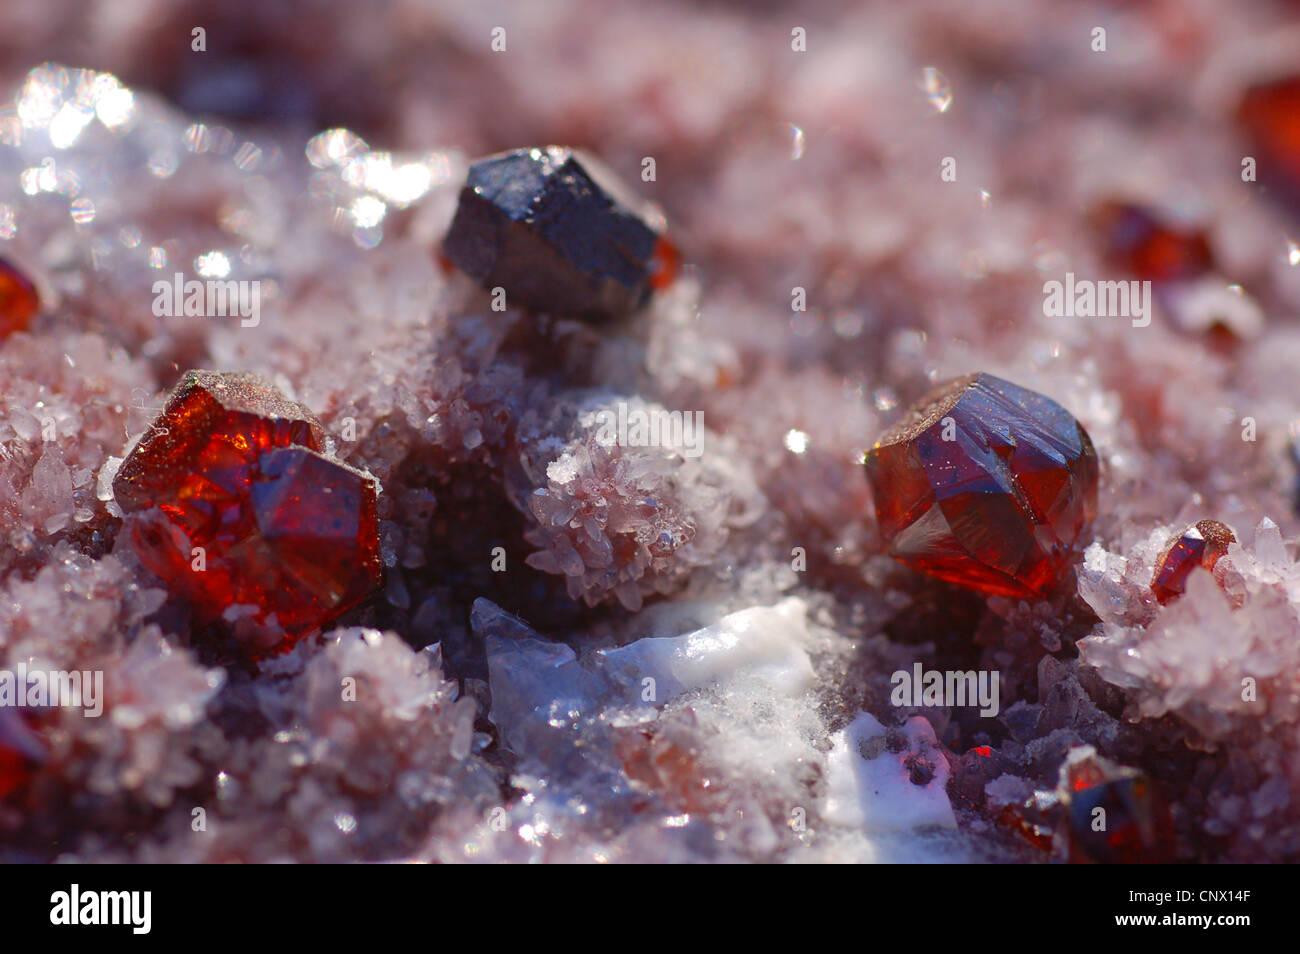 sphalerite crystals on quartz - Stock Image